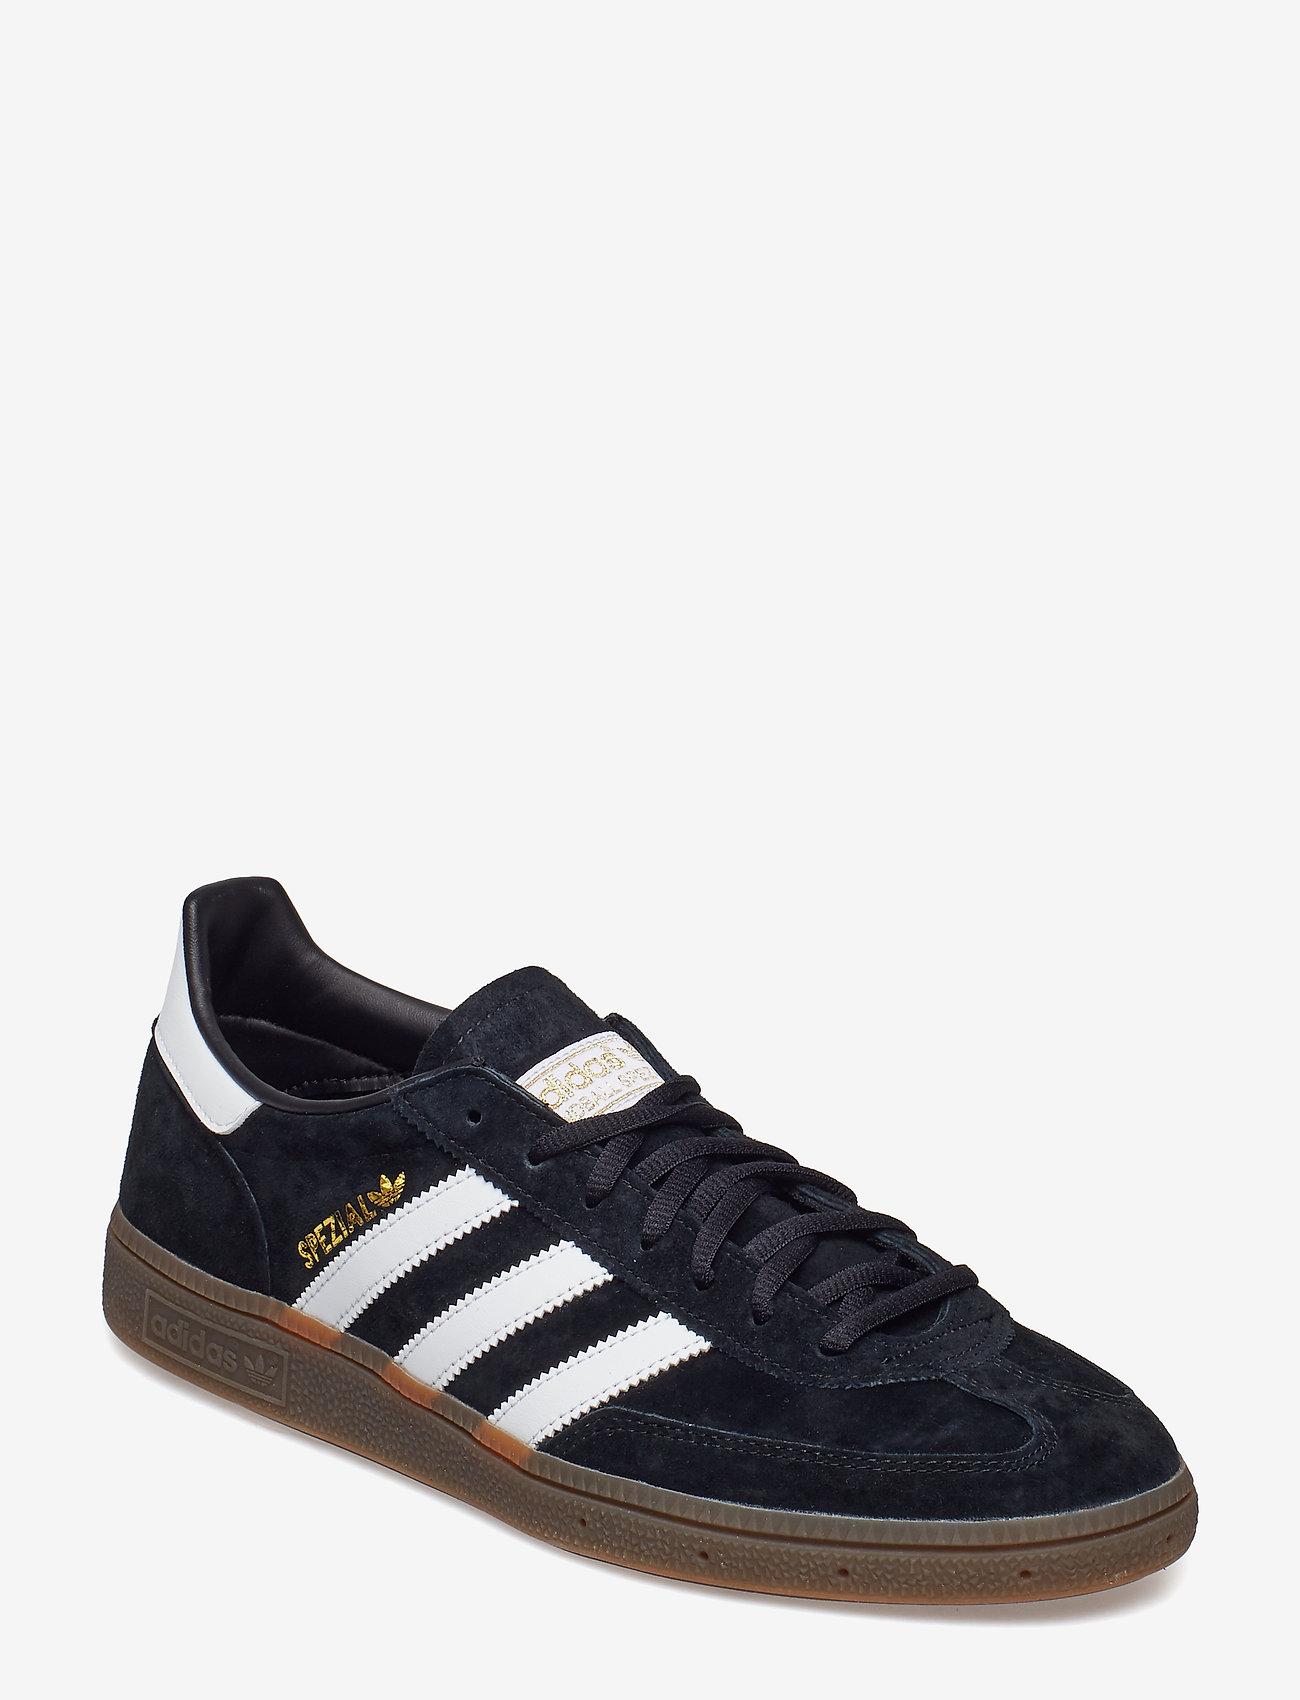 adidas Originals - Handball Spezial - lav ankel - cblack/ftwwht/gum5 - 0